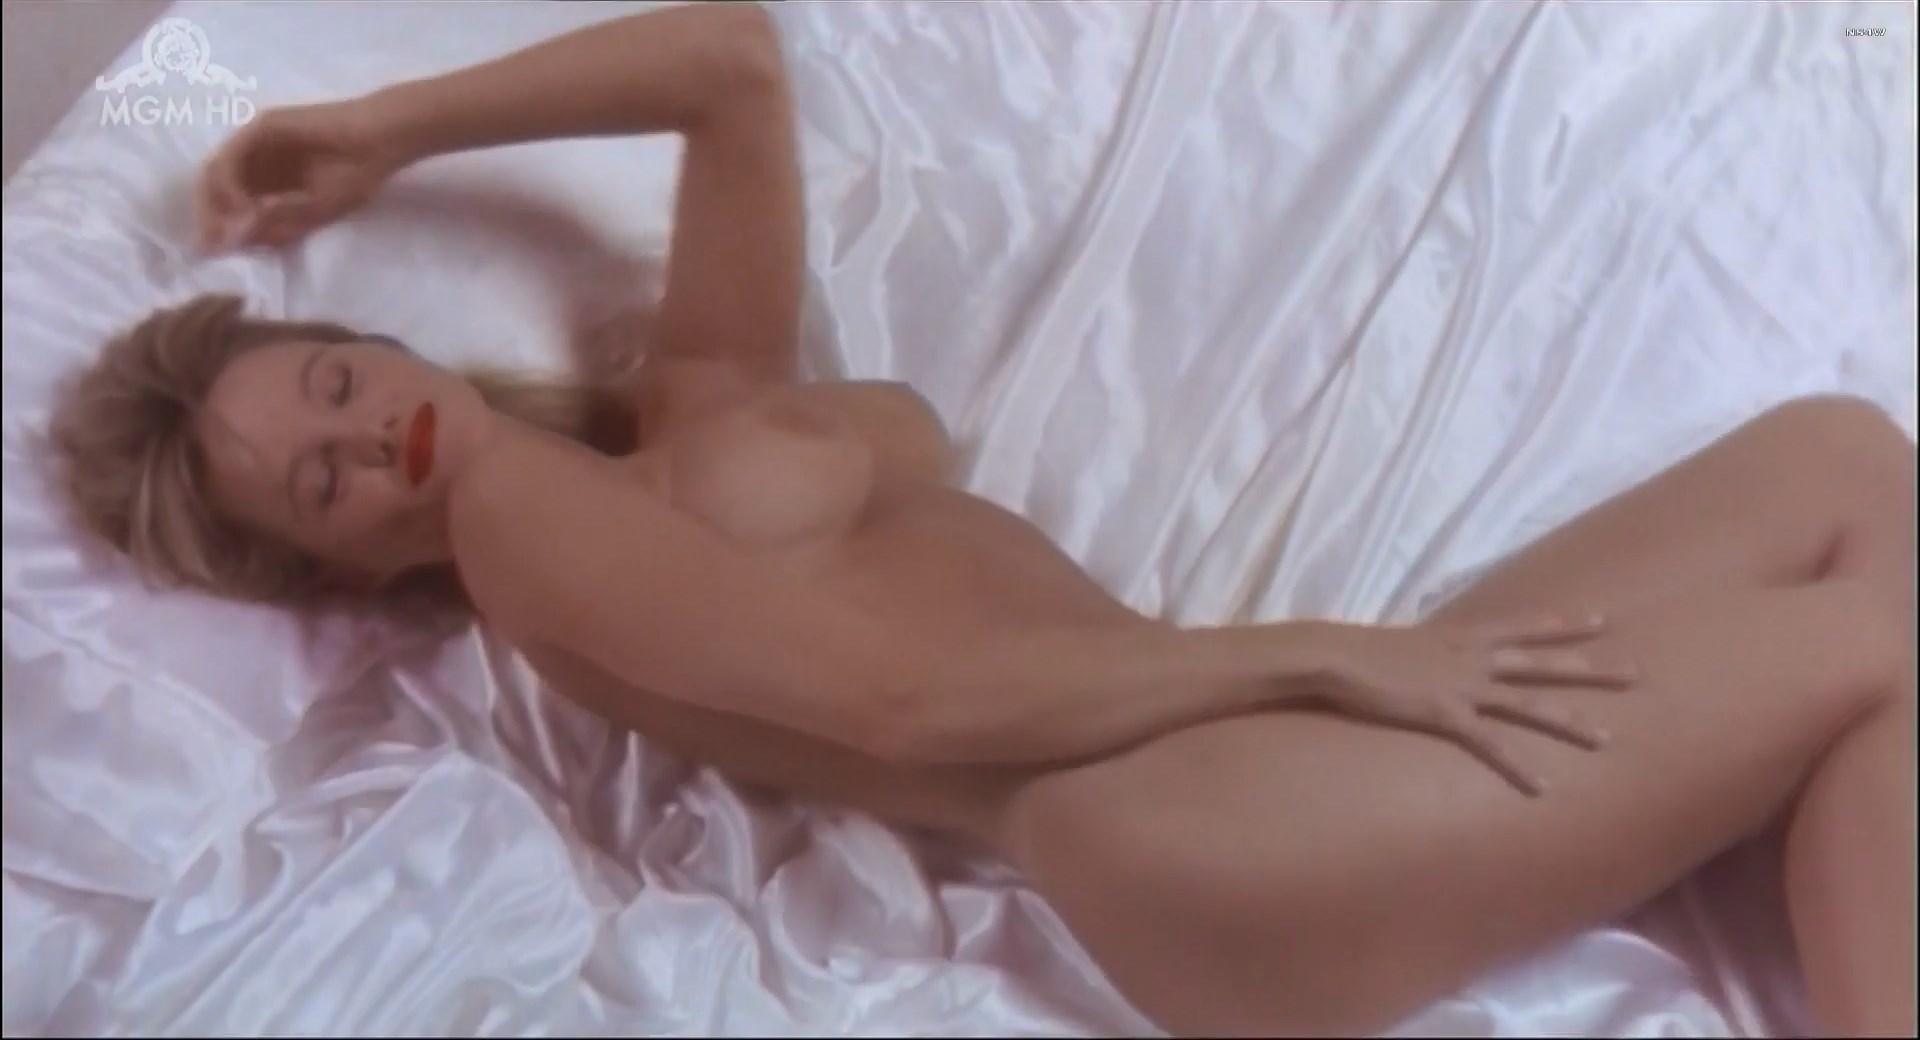 Angela Serna Porno watch online - angela cremonte - hispania, la leyenda s01